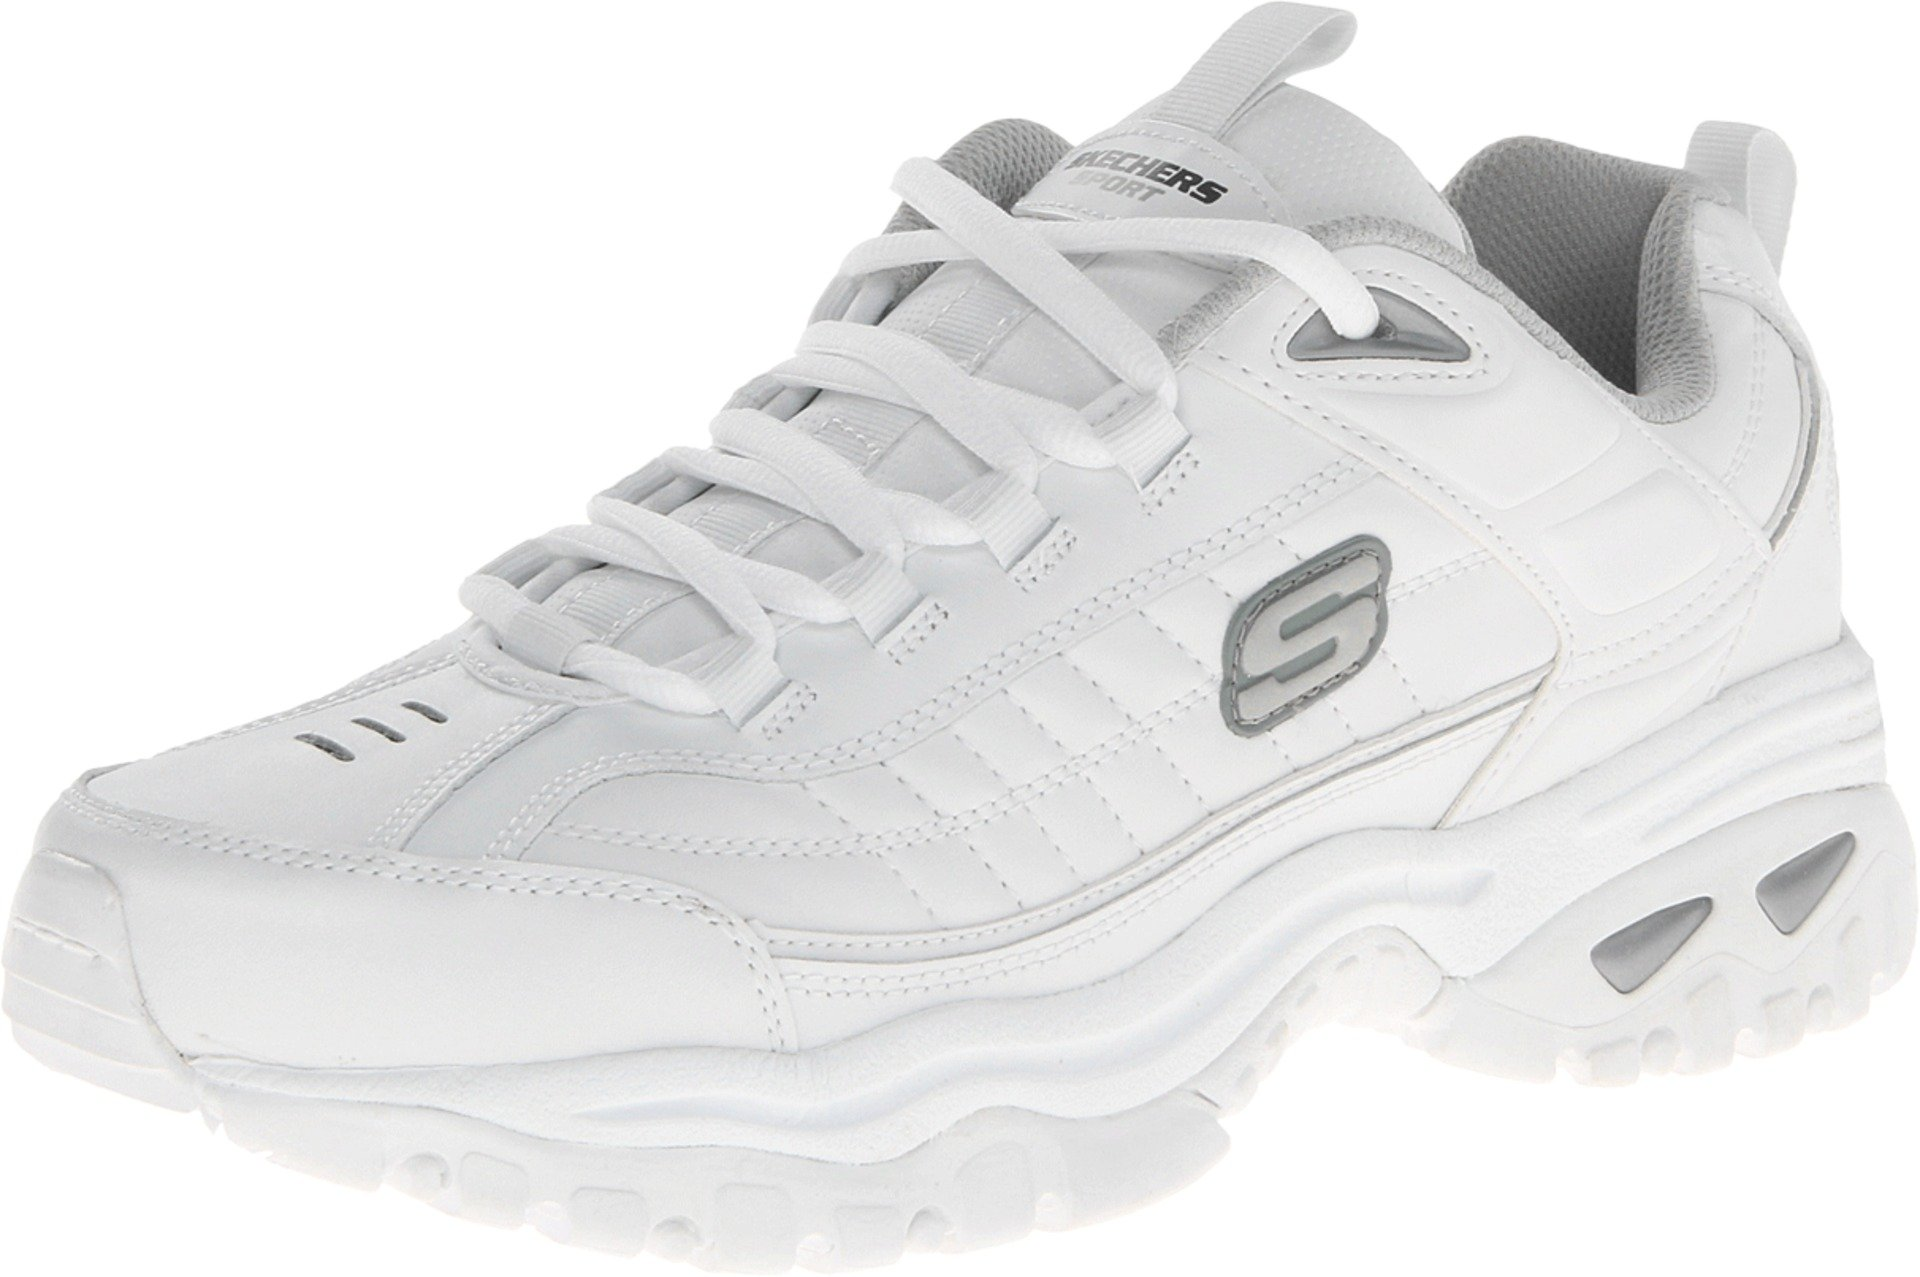 Skechers Men's Energy Afterburn Lace-Up Sneaker,White,10 M US